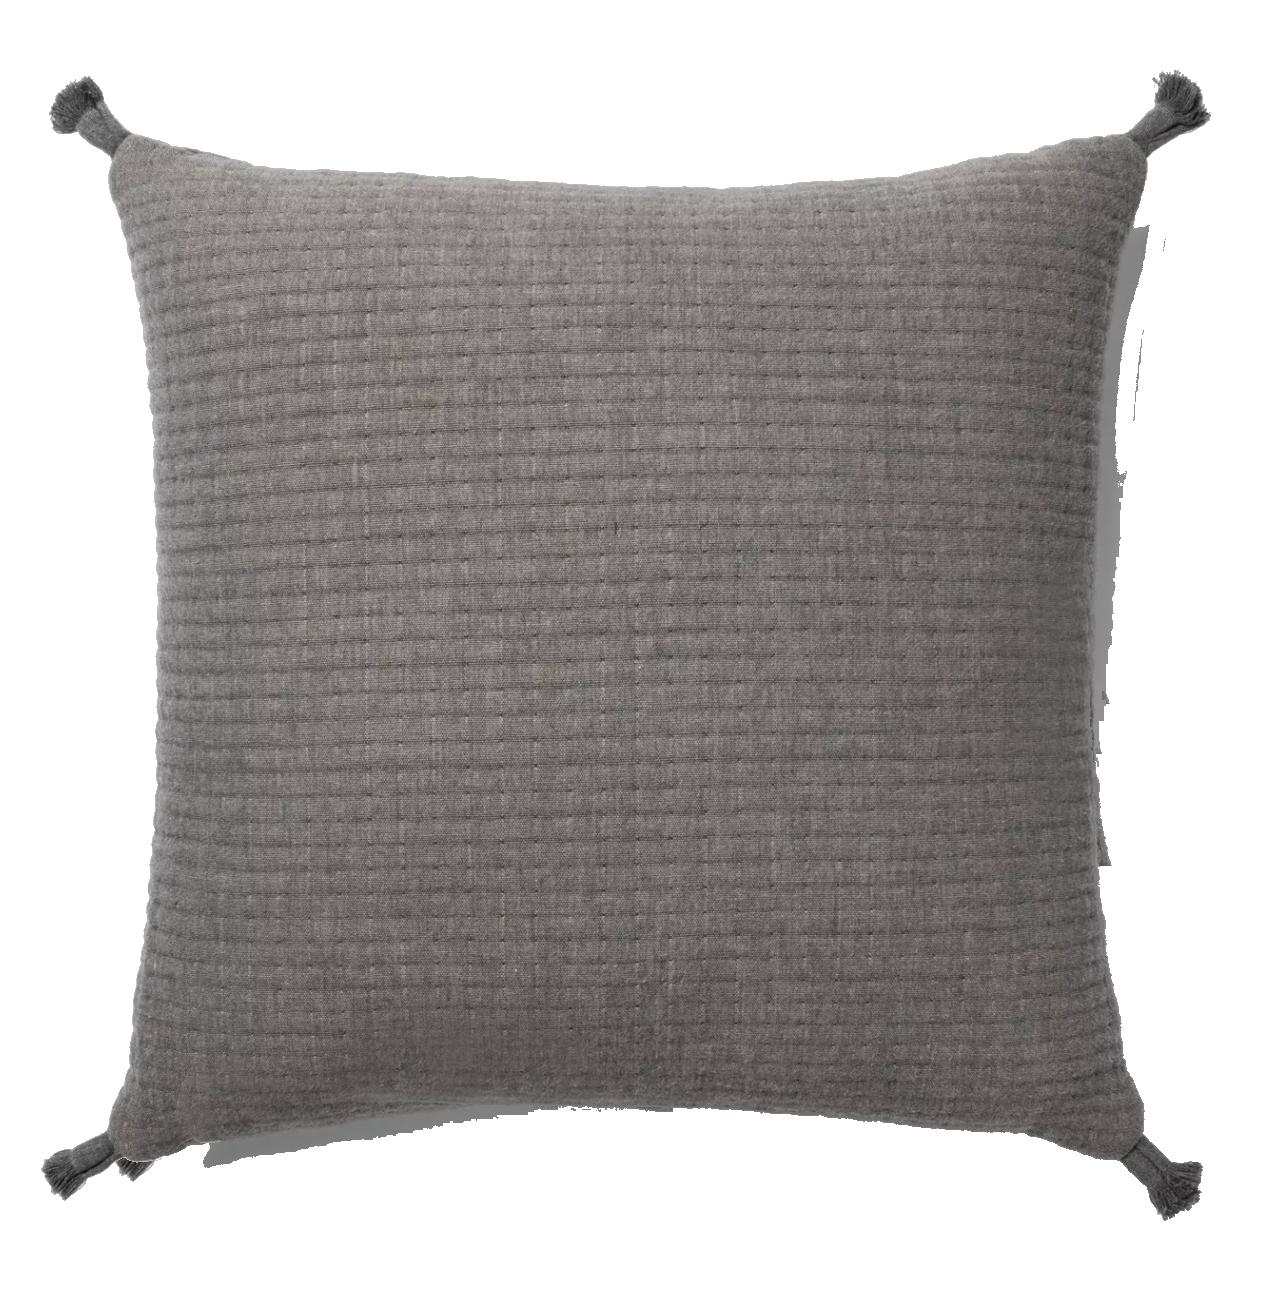 Gauze Texture Square Throw Pillow Gray + Nate Berkus - Project 62™.png